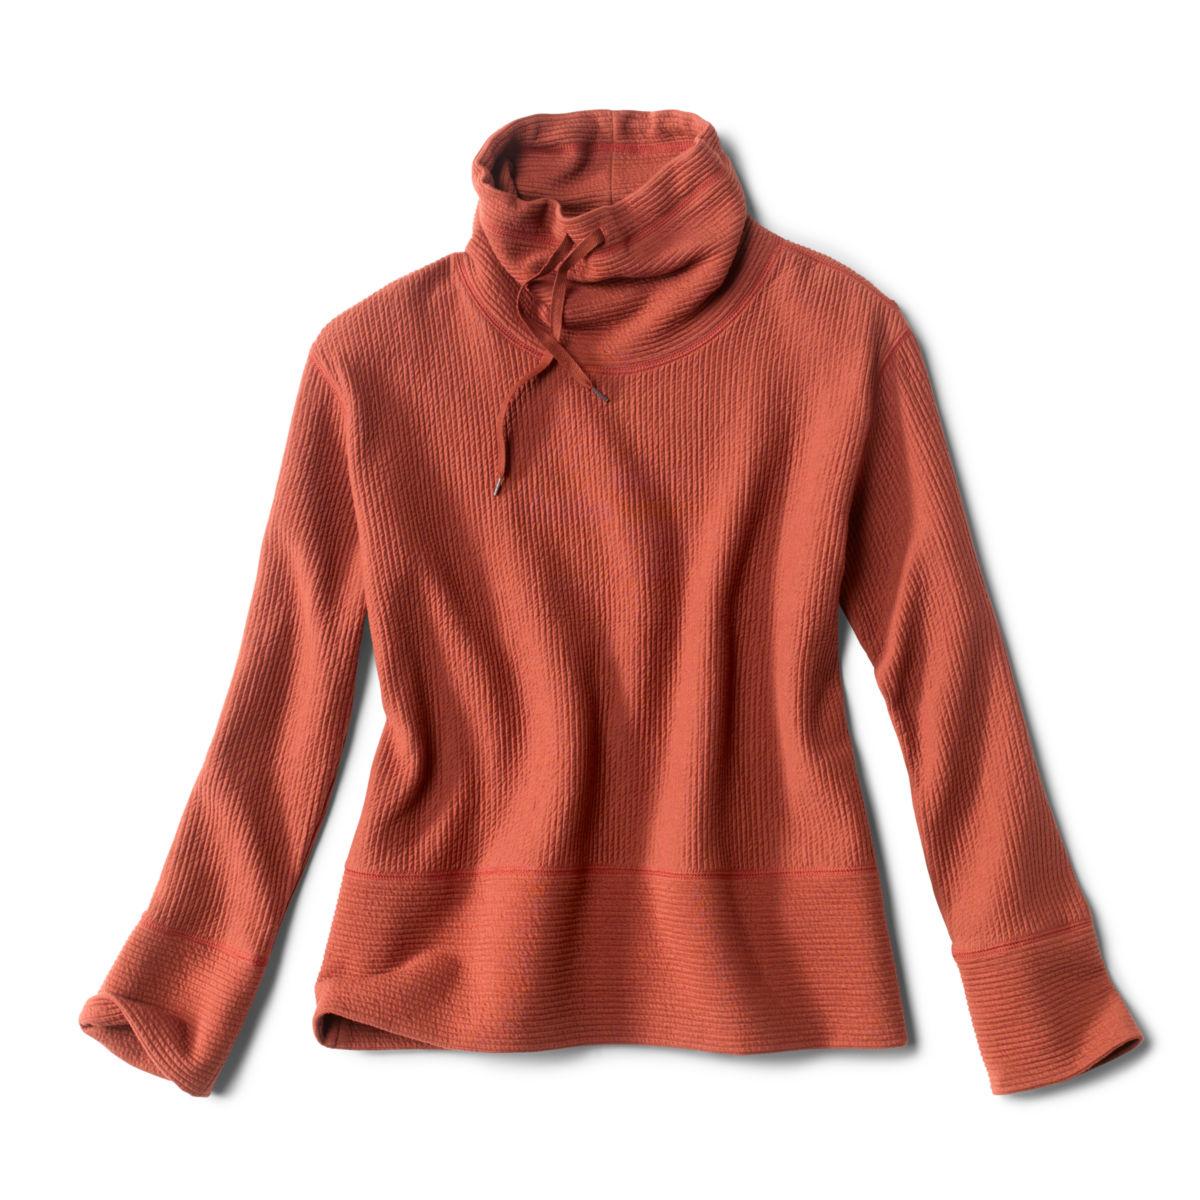 Textured Cowl Sweatshirt - SPICEimage number 0